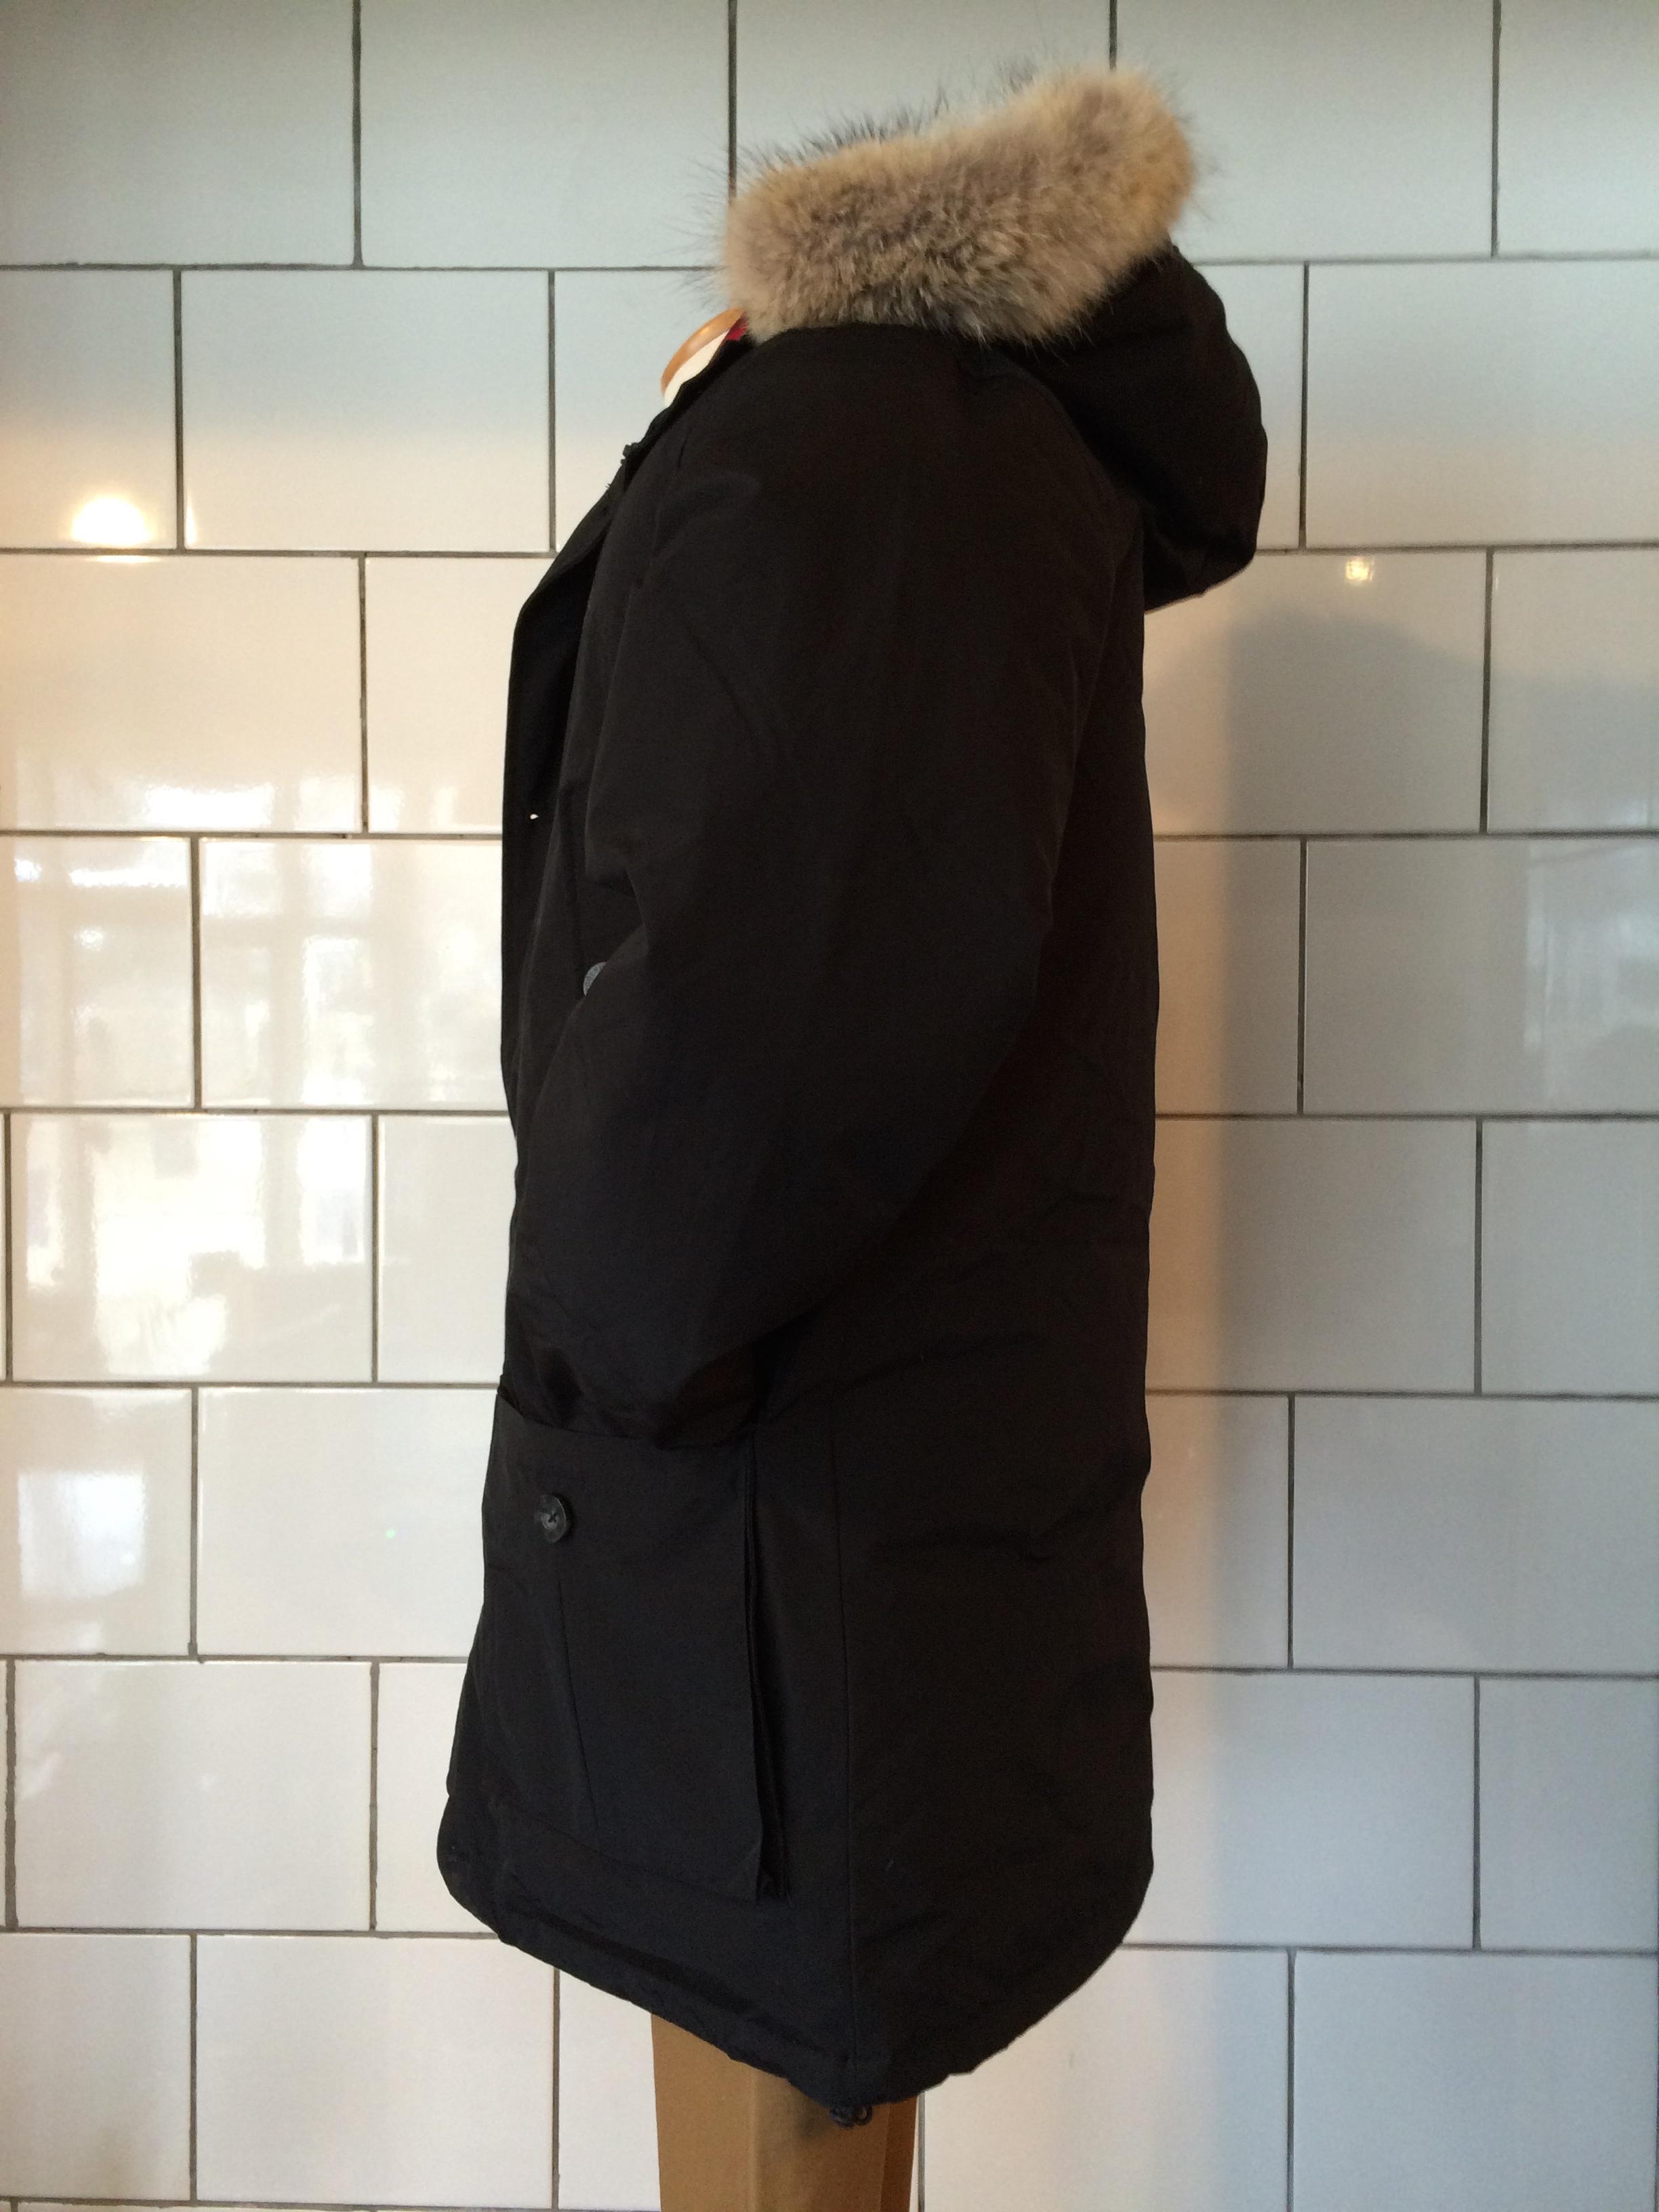 woolrich men 39 s arctic down parka garmentory. Black Bedroom Furniture Sets. Home Design Ideas